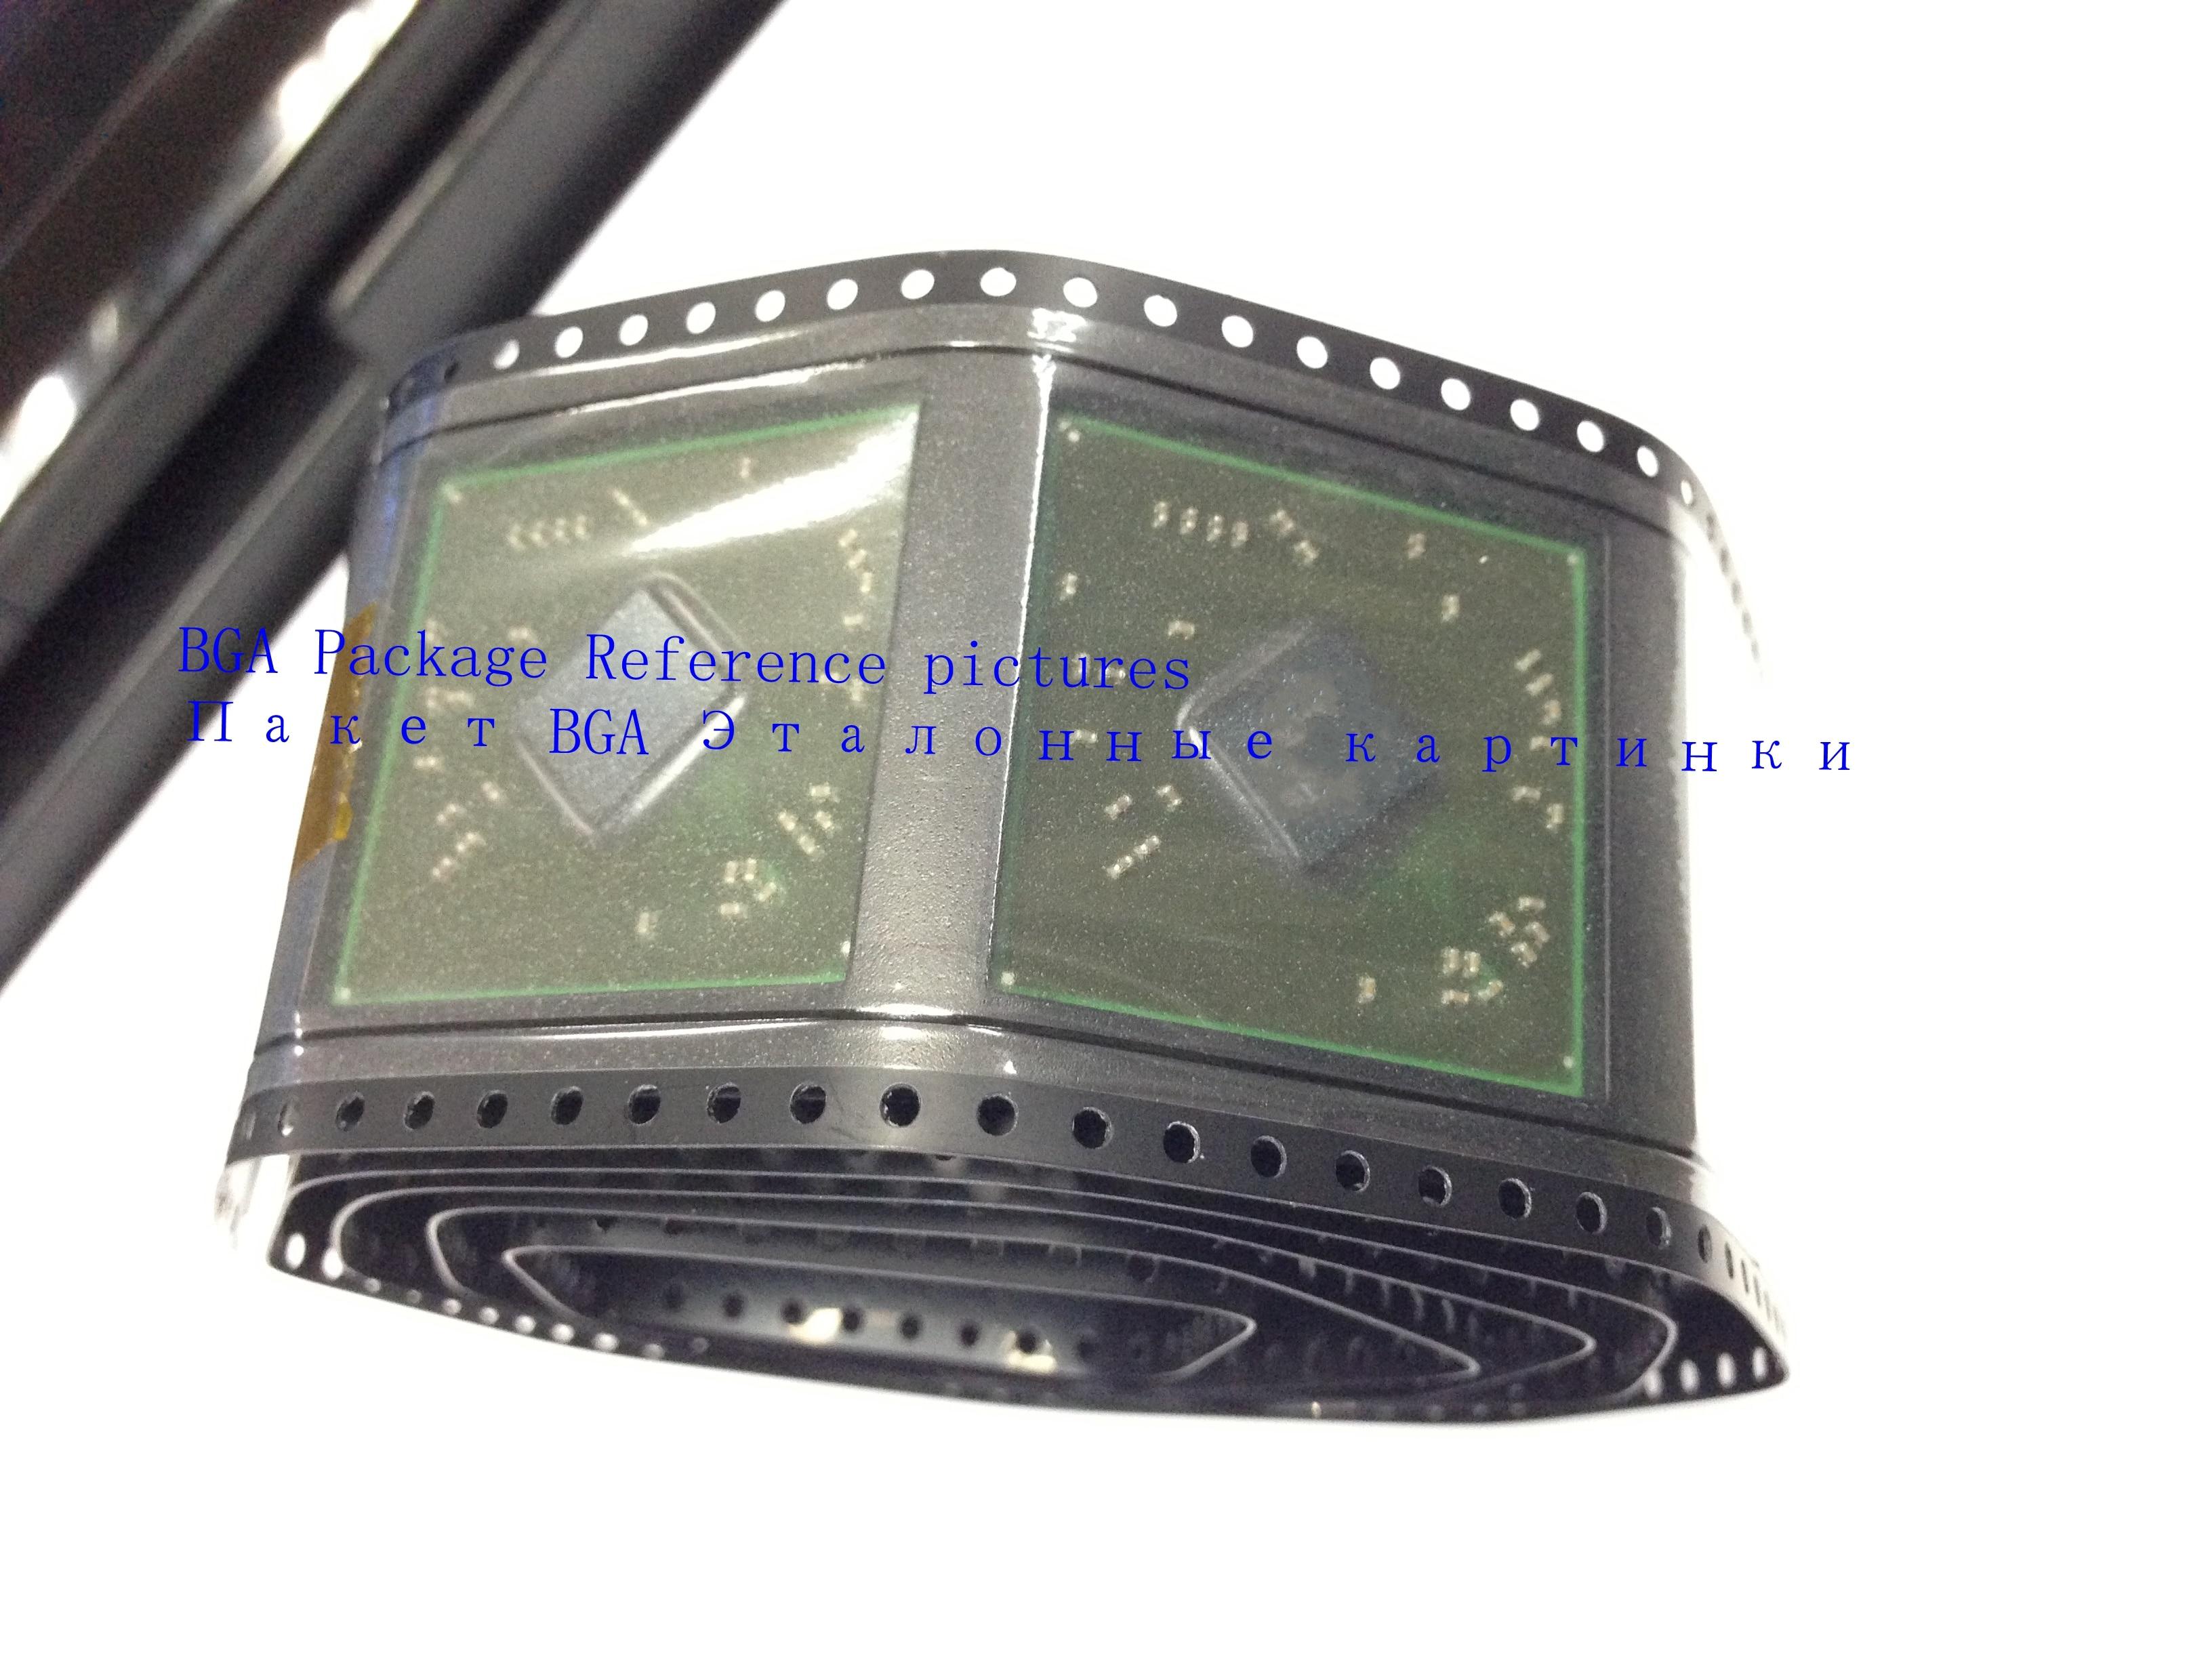 1 pz/lotto 100% Nuovo MCP89UL-A3 MCP89UL A3 BGA Chipset1 pz/lotto 100% Nuovo MCP89UL-A3 MCP89UL A3 BGA Chipset